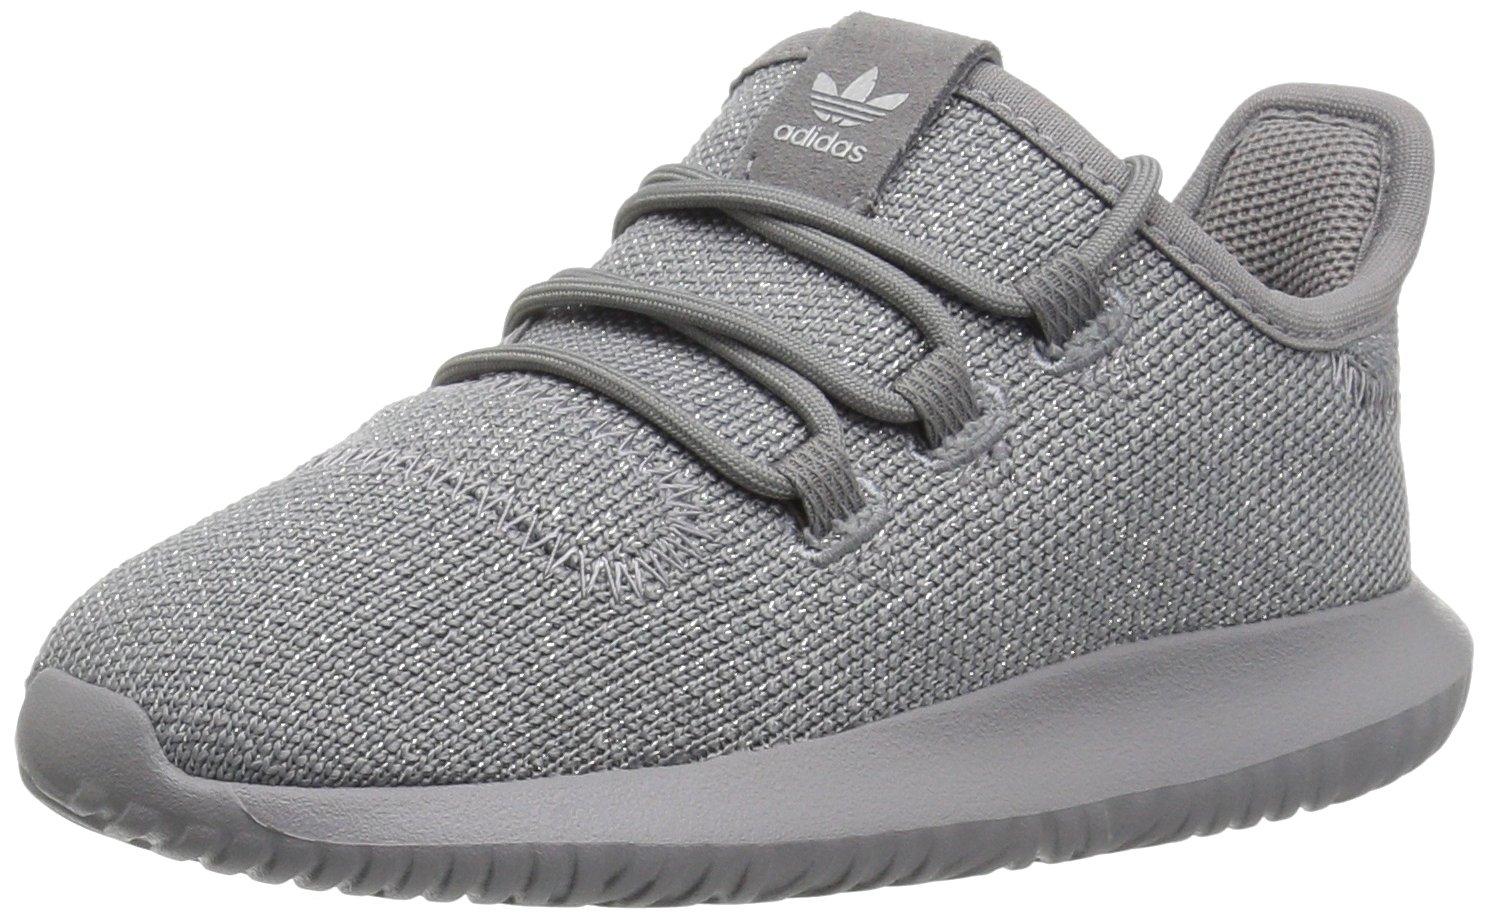 adidas Originals Boys' Tubular Shadow I Sneaker, Grey Three/Grey Three/Metallic Silver, 5 M US Toddler